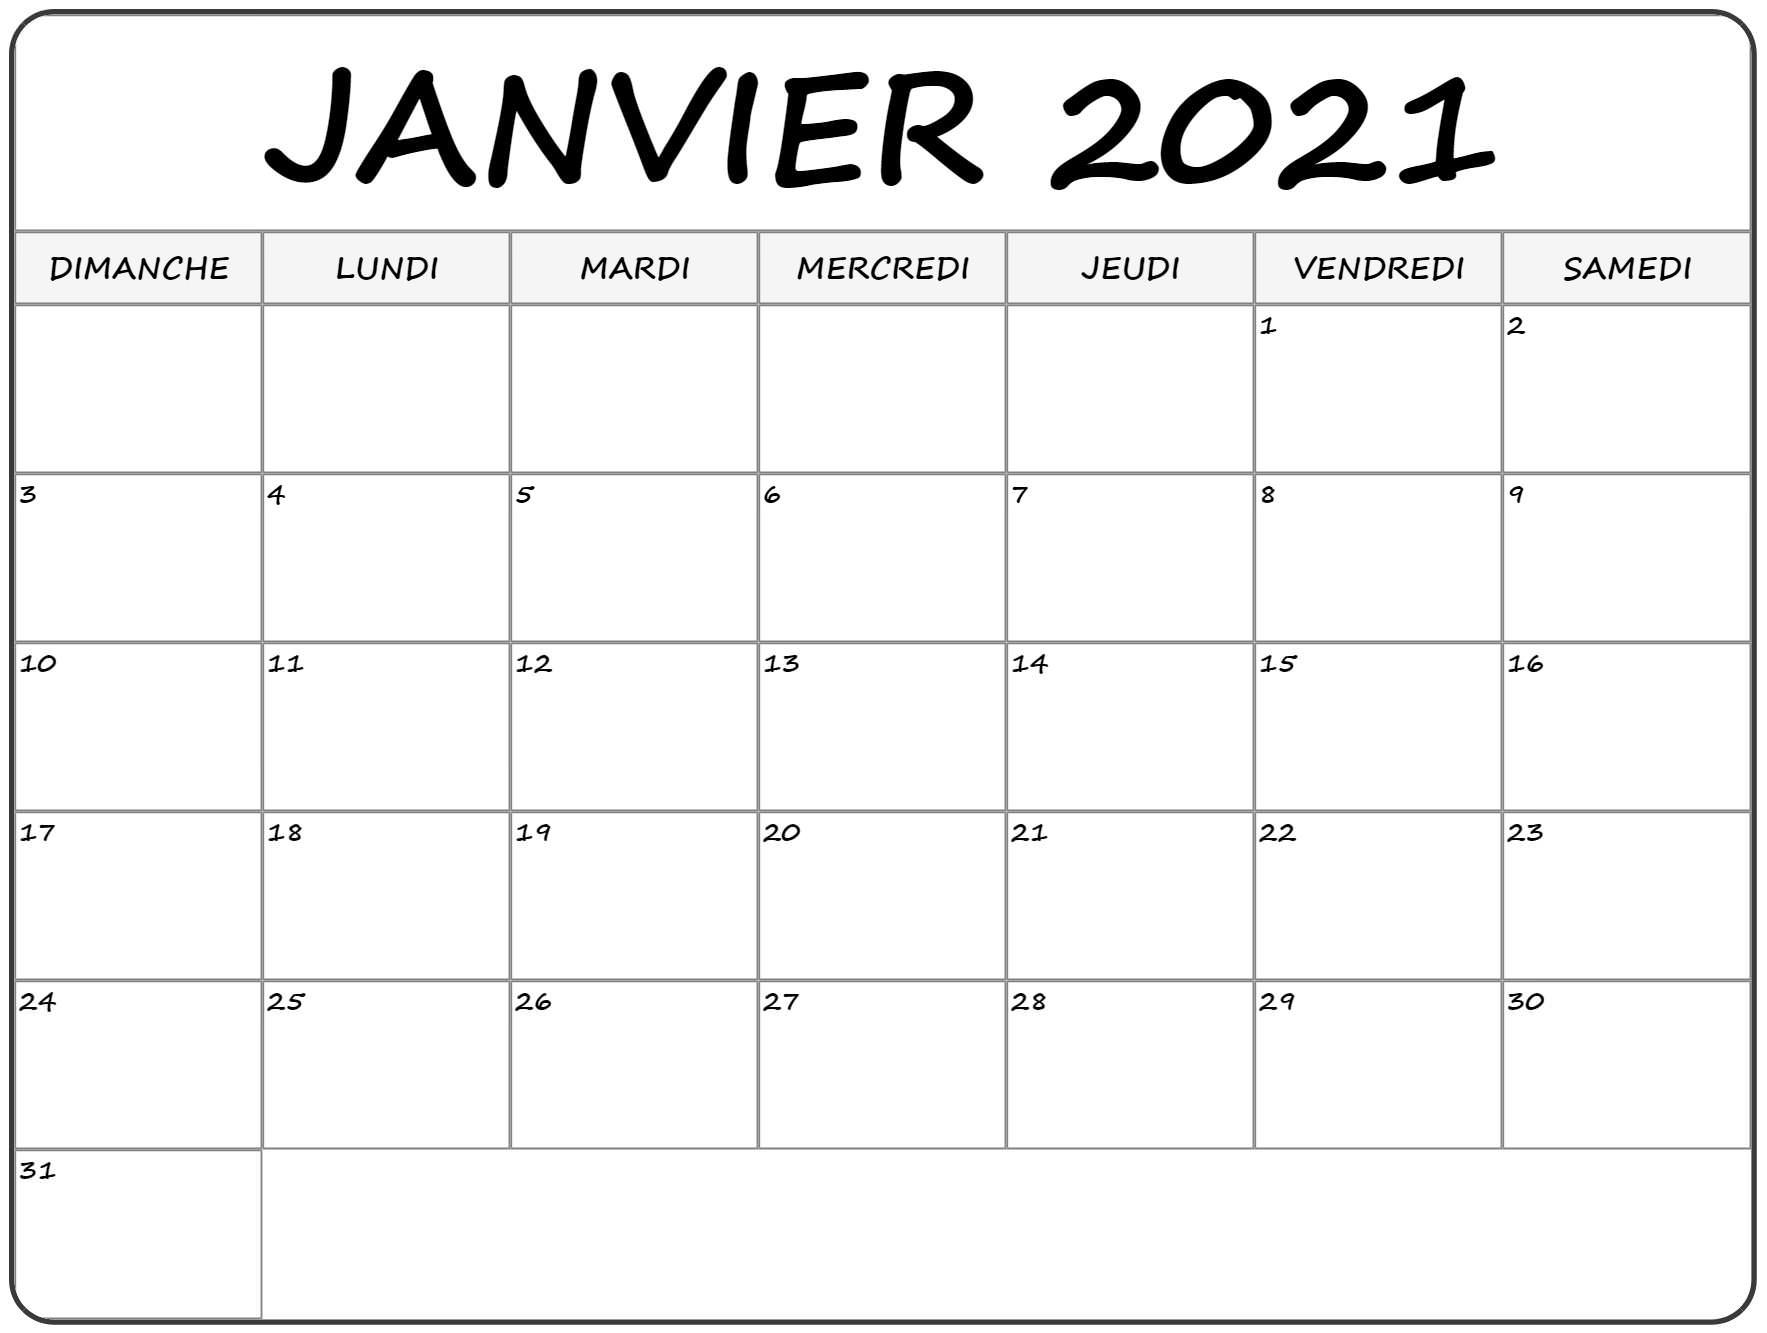 Calendrier Janvier Fevrier Mars 2021 Calendrier Janvier Fevrier Mars Avril 2021 in 2020 | In this